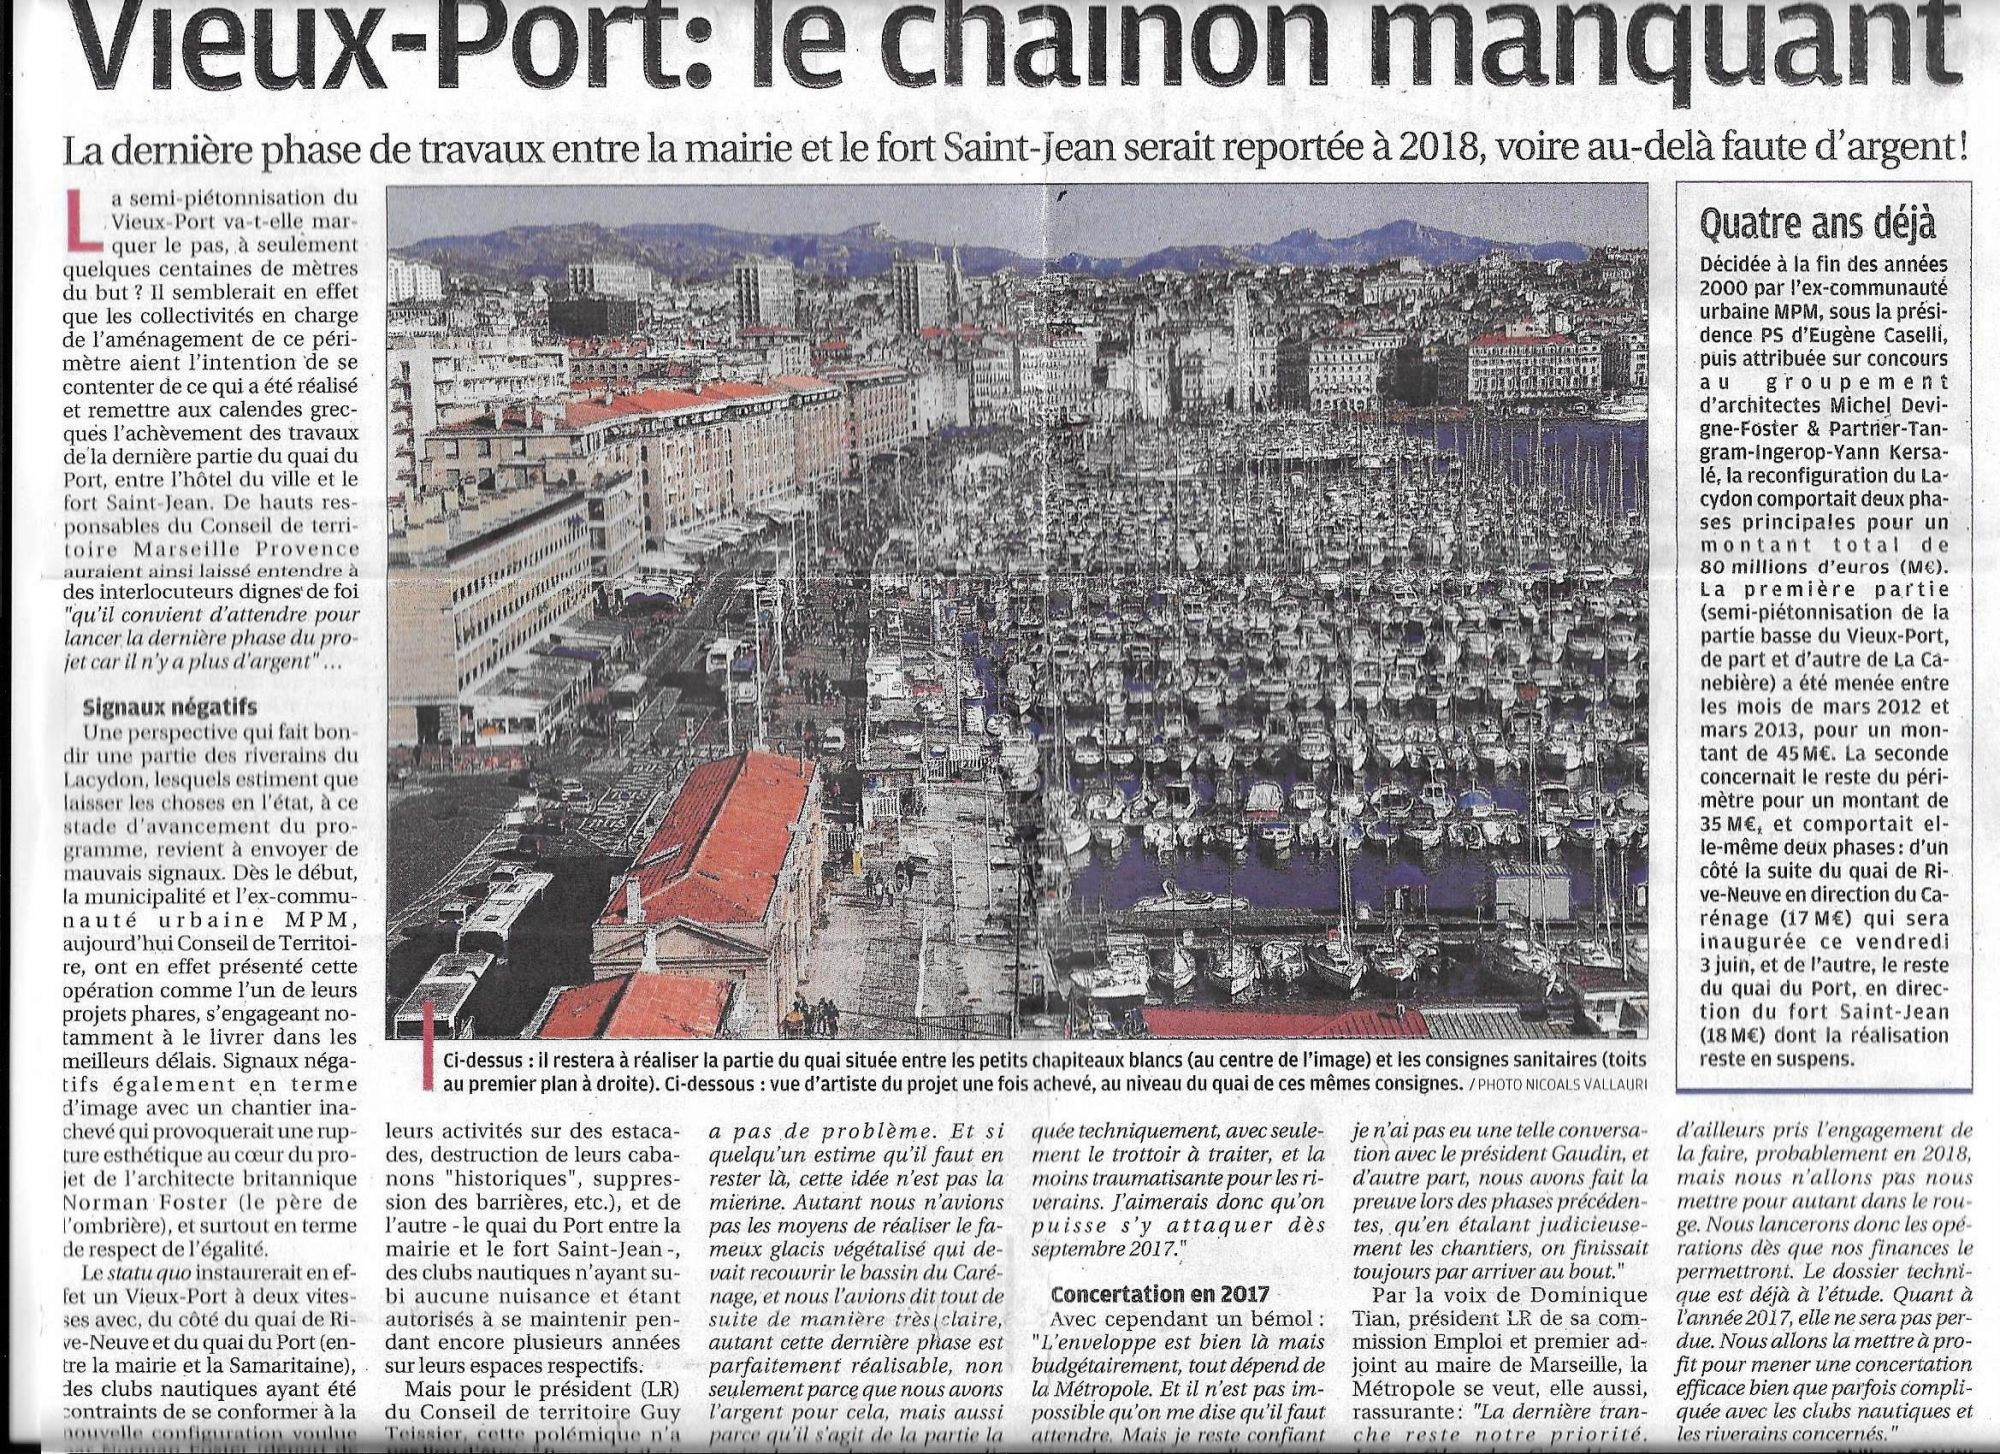 2018-barrieres-vieux-port-1